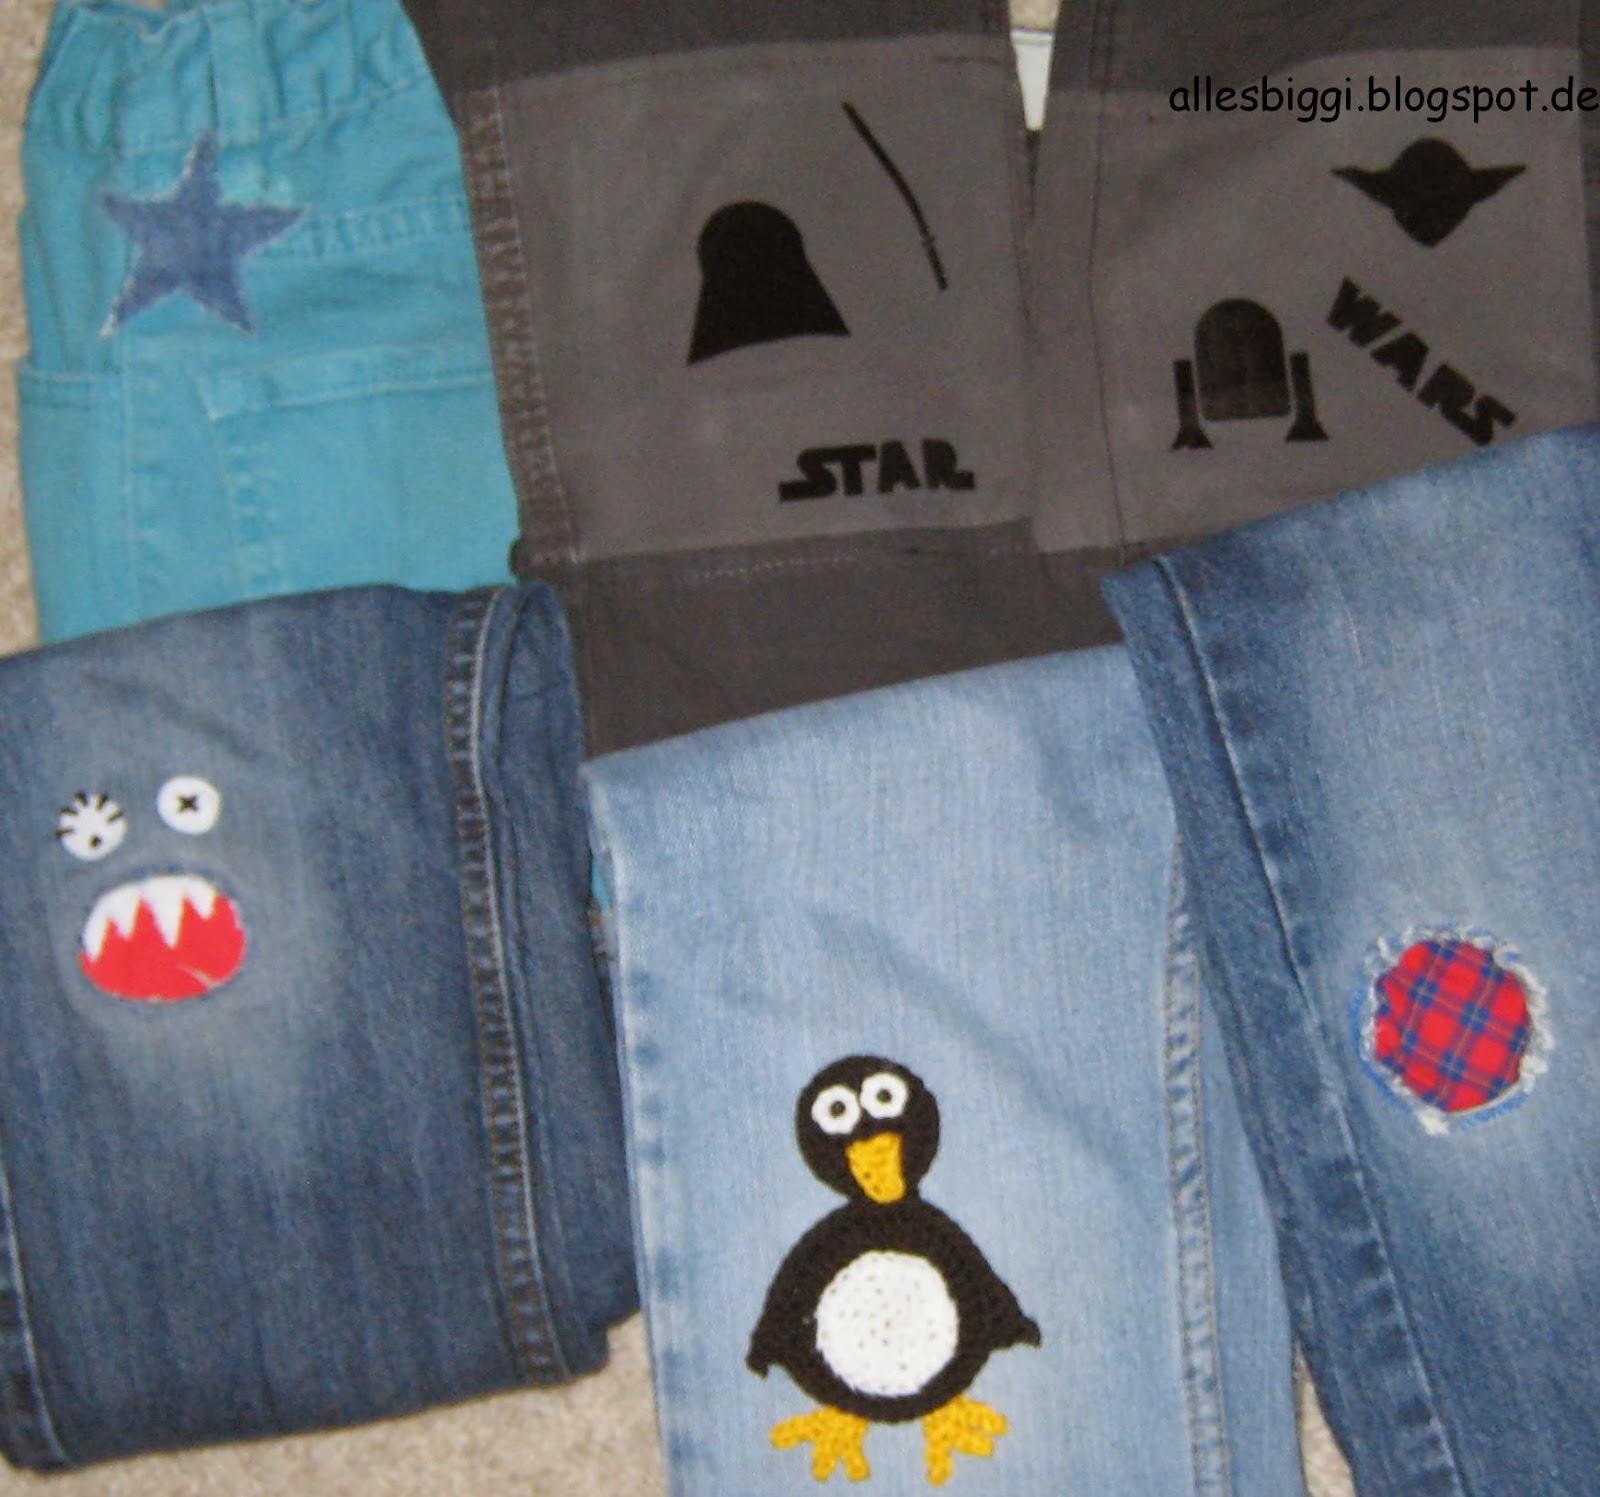 http://allesbiggi.blogspot.de/2014/01/jeans-reparaturen.html